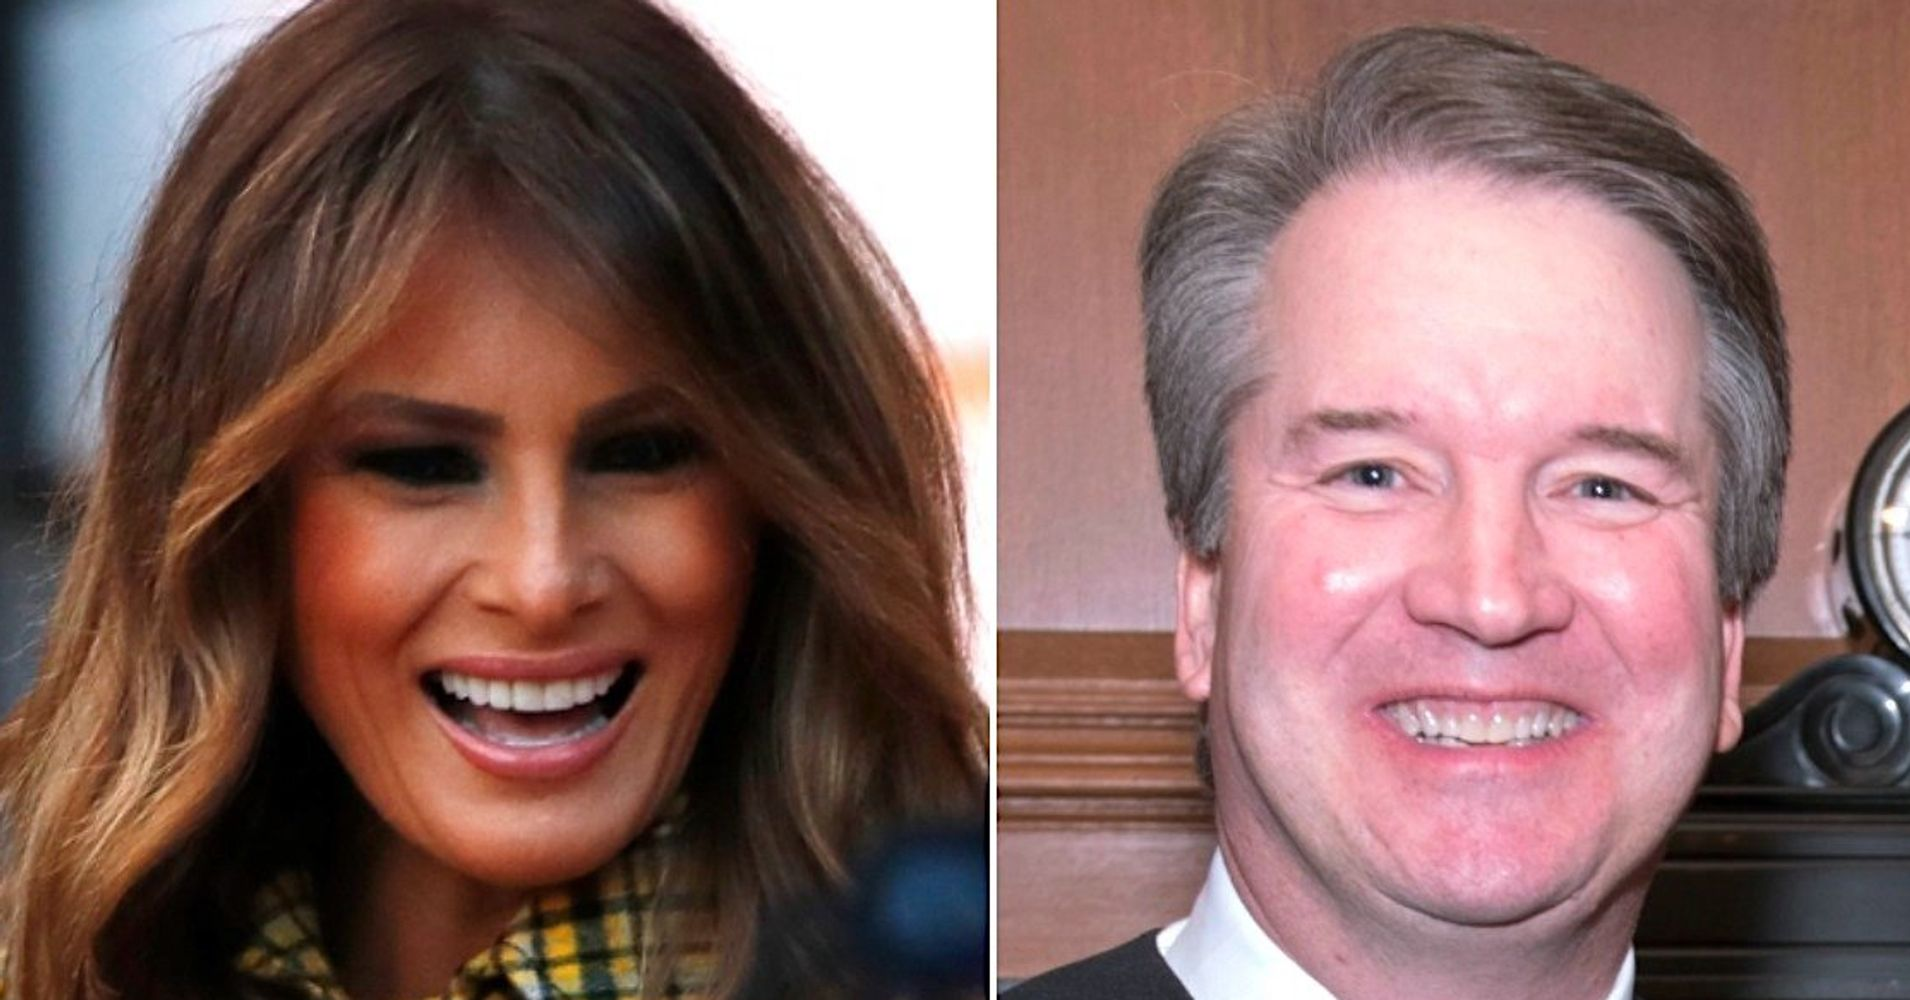 Melania Trump Raises Eyebrows With Tweet About Brett Kavanaughs